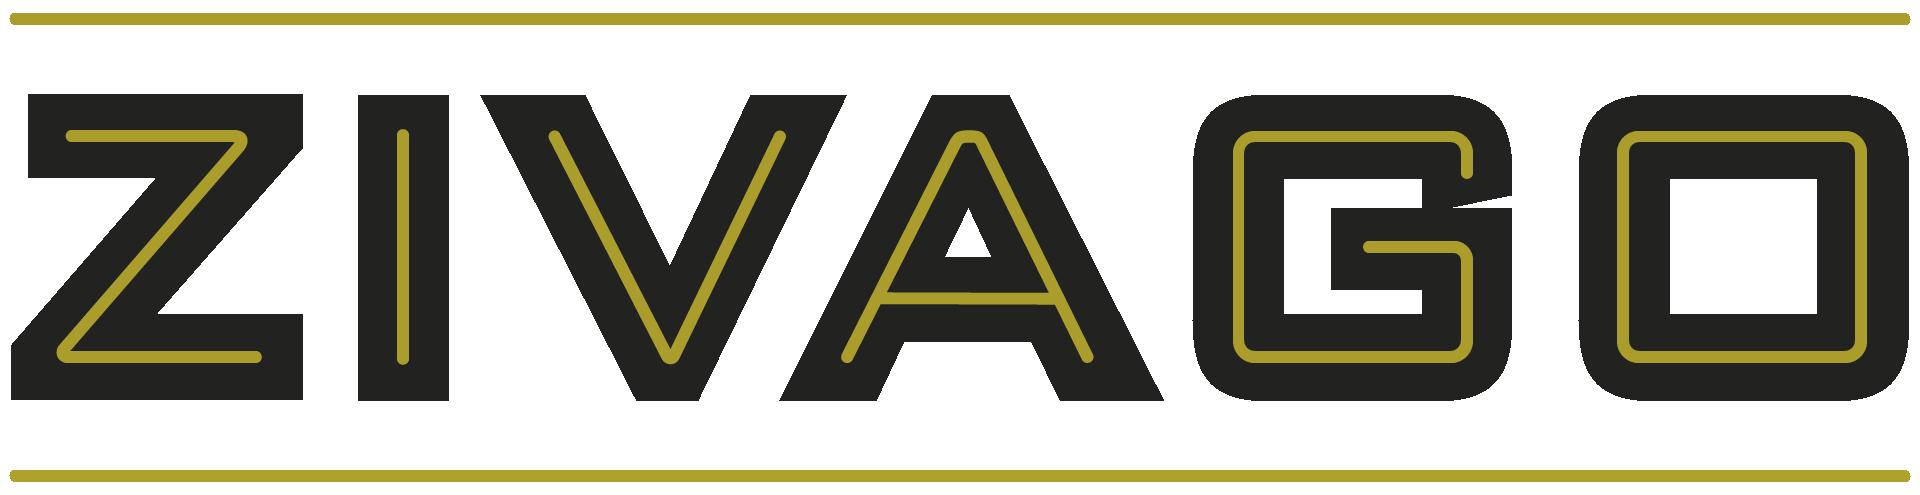 Zivago